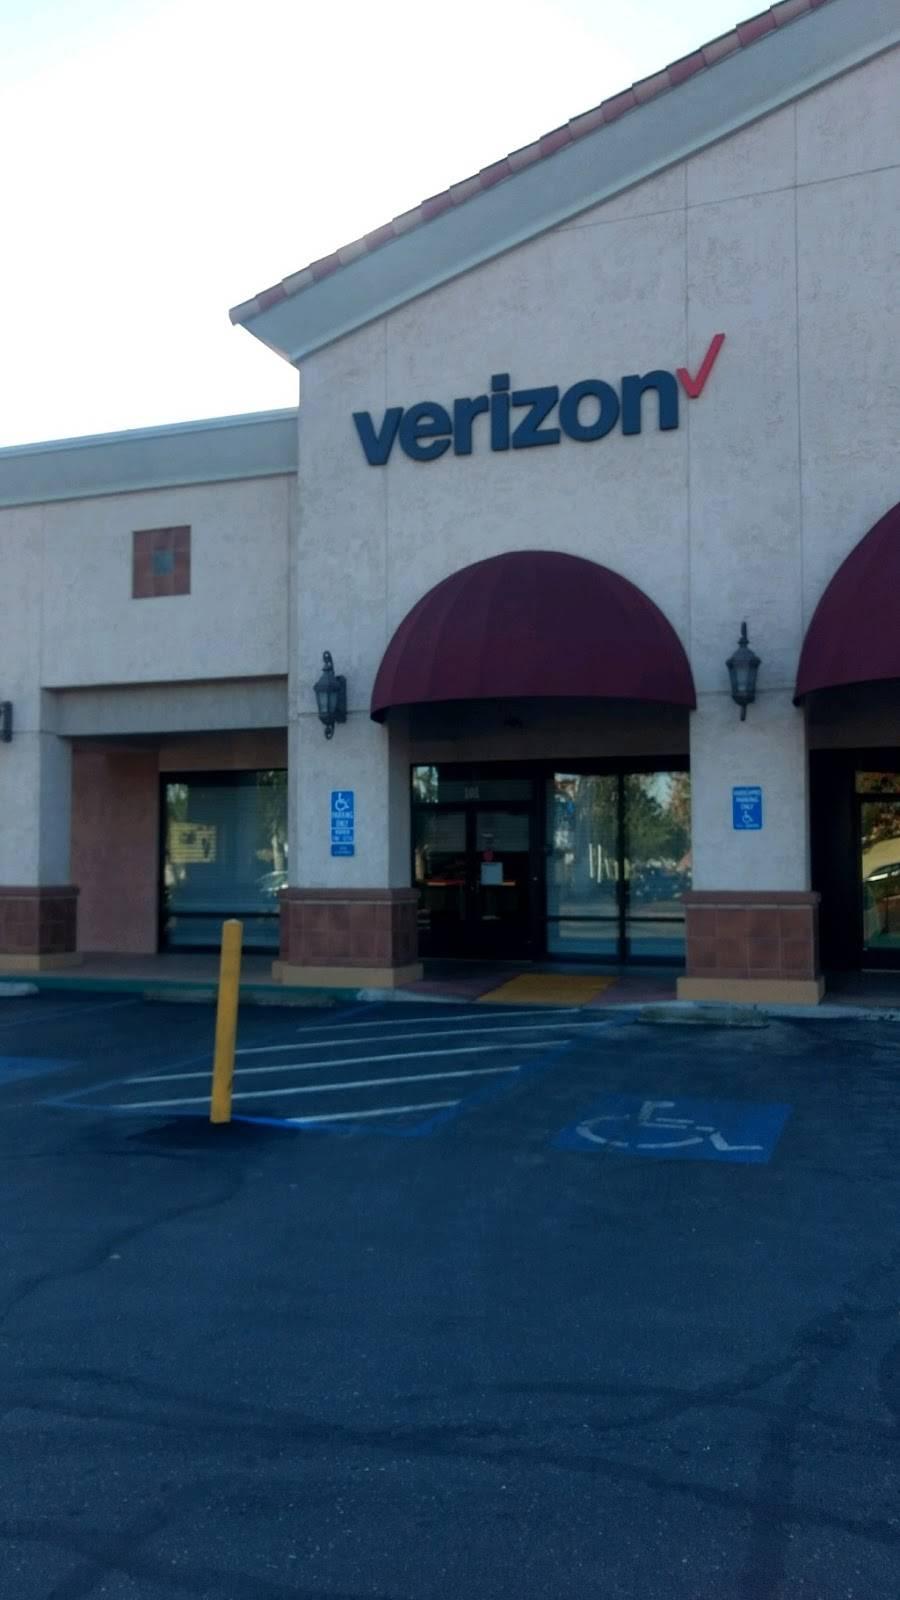 Verizon - store  | Photo 5 of 6 | Address: 7723 N Blackstone Ave Suite 101, Fresno, CA 93720, USA | Phone: (559) 451-0556